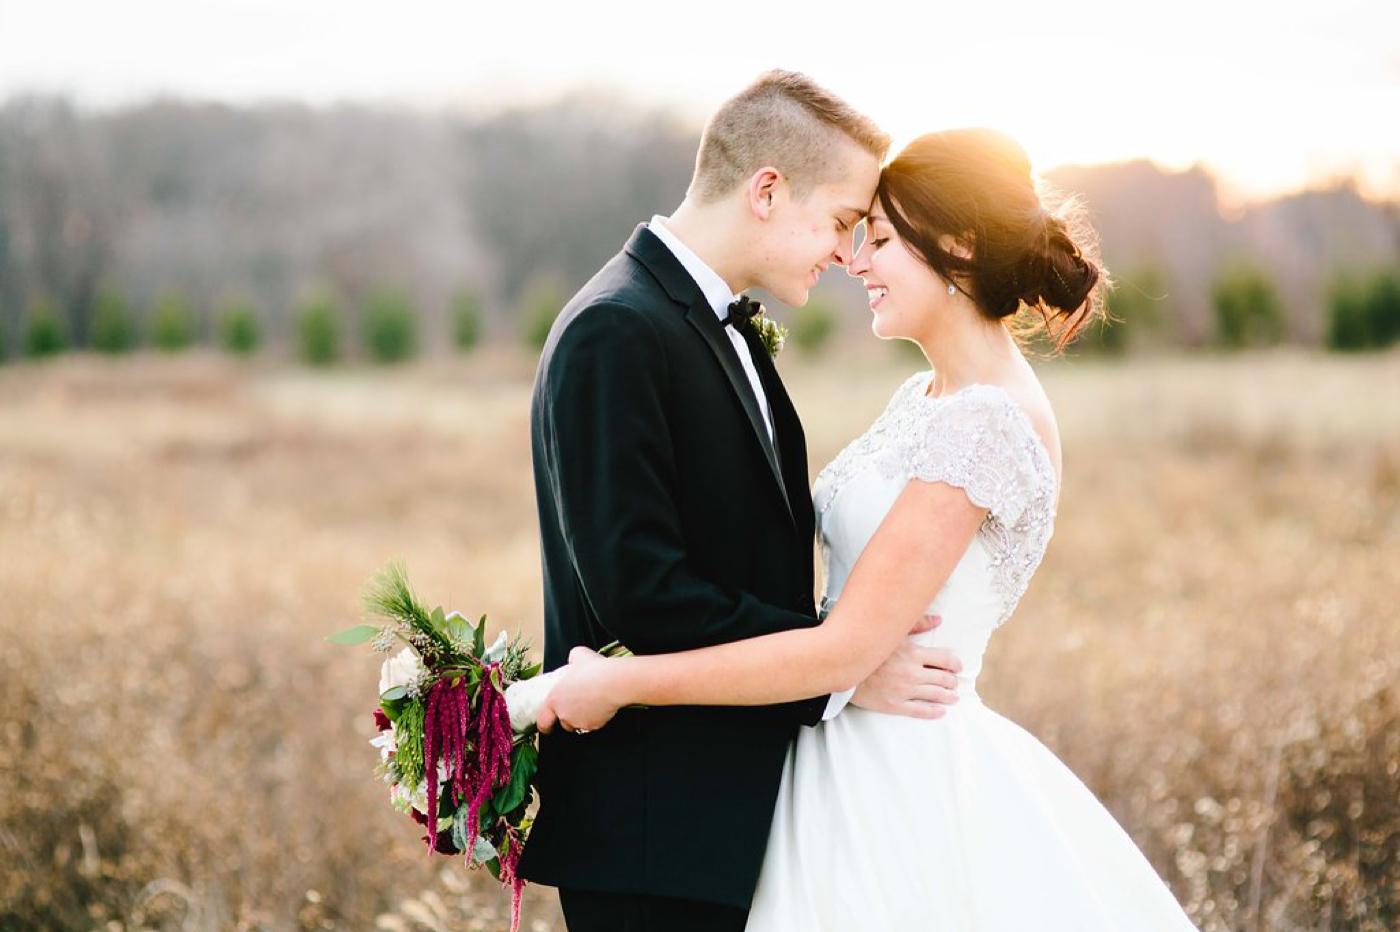 chicago-fine-art-wedding-photography-jacobs33